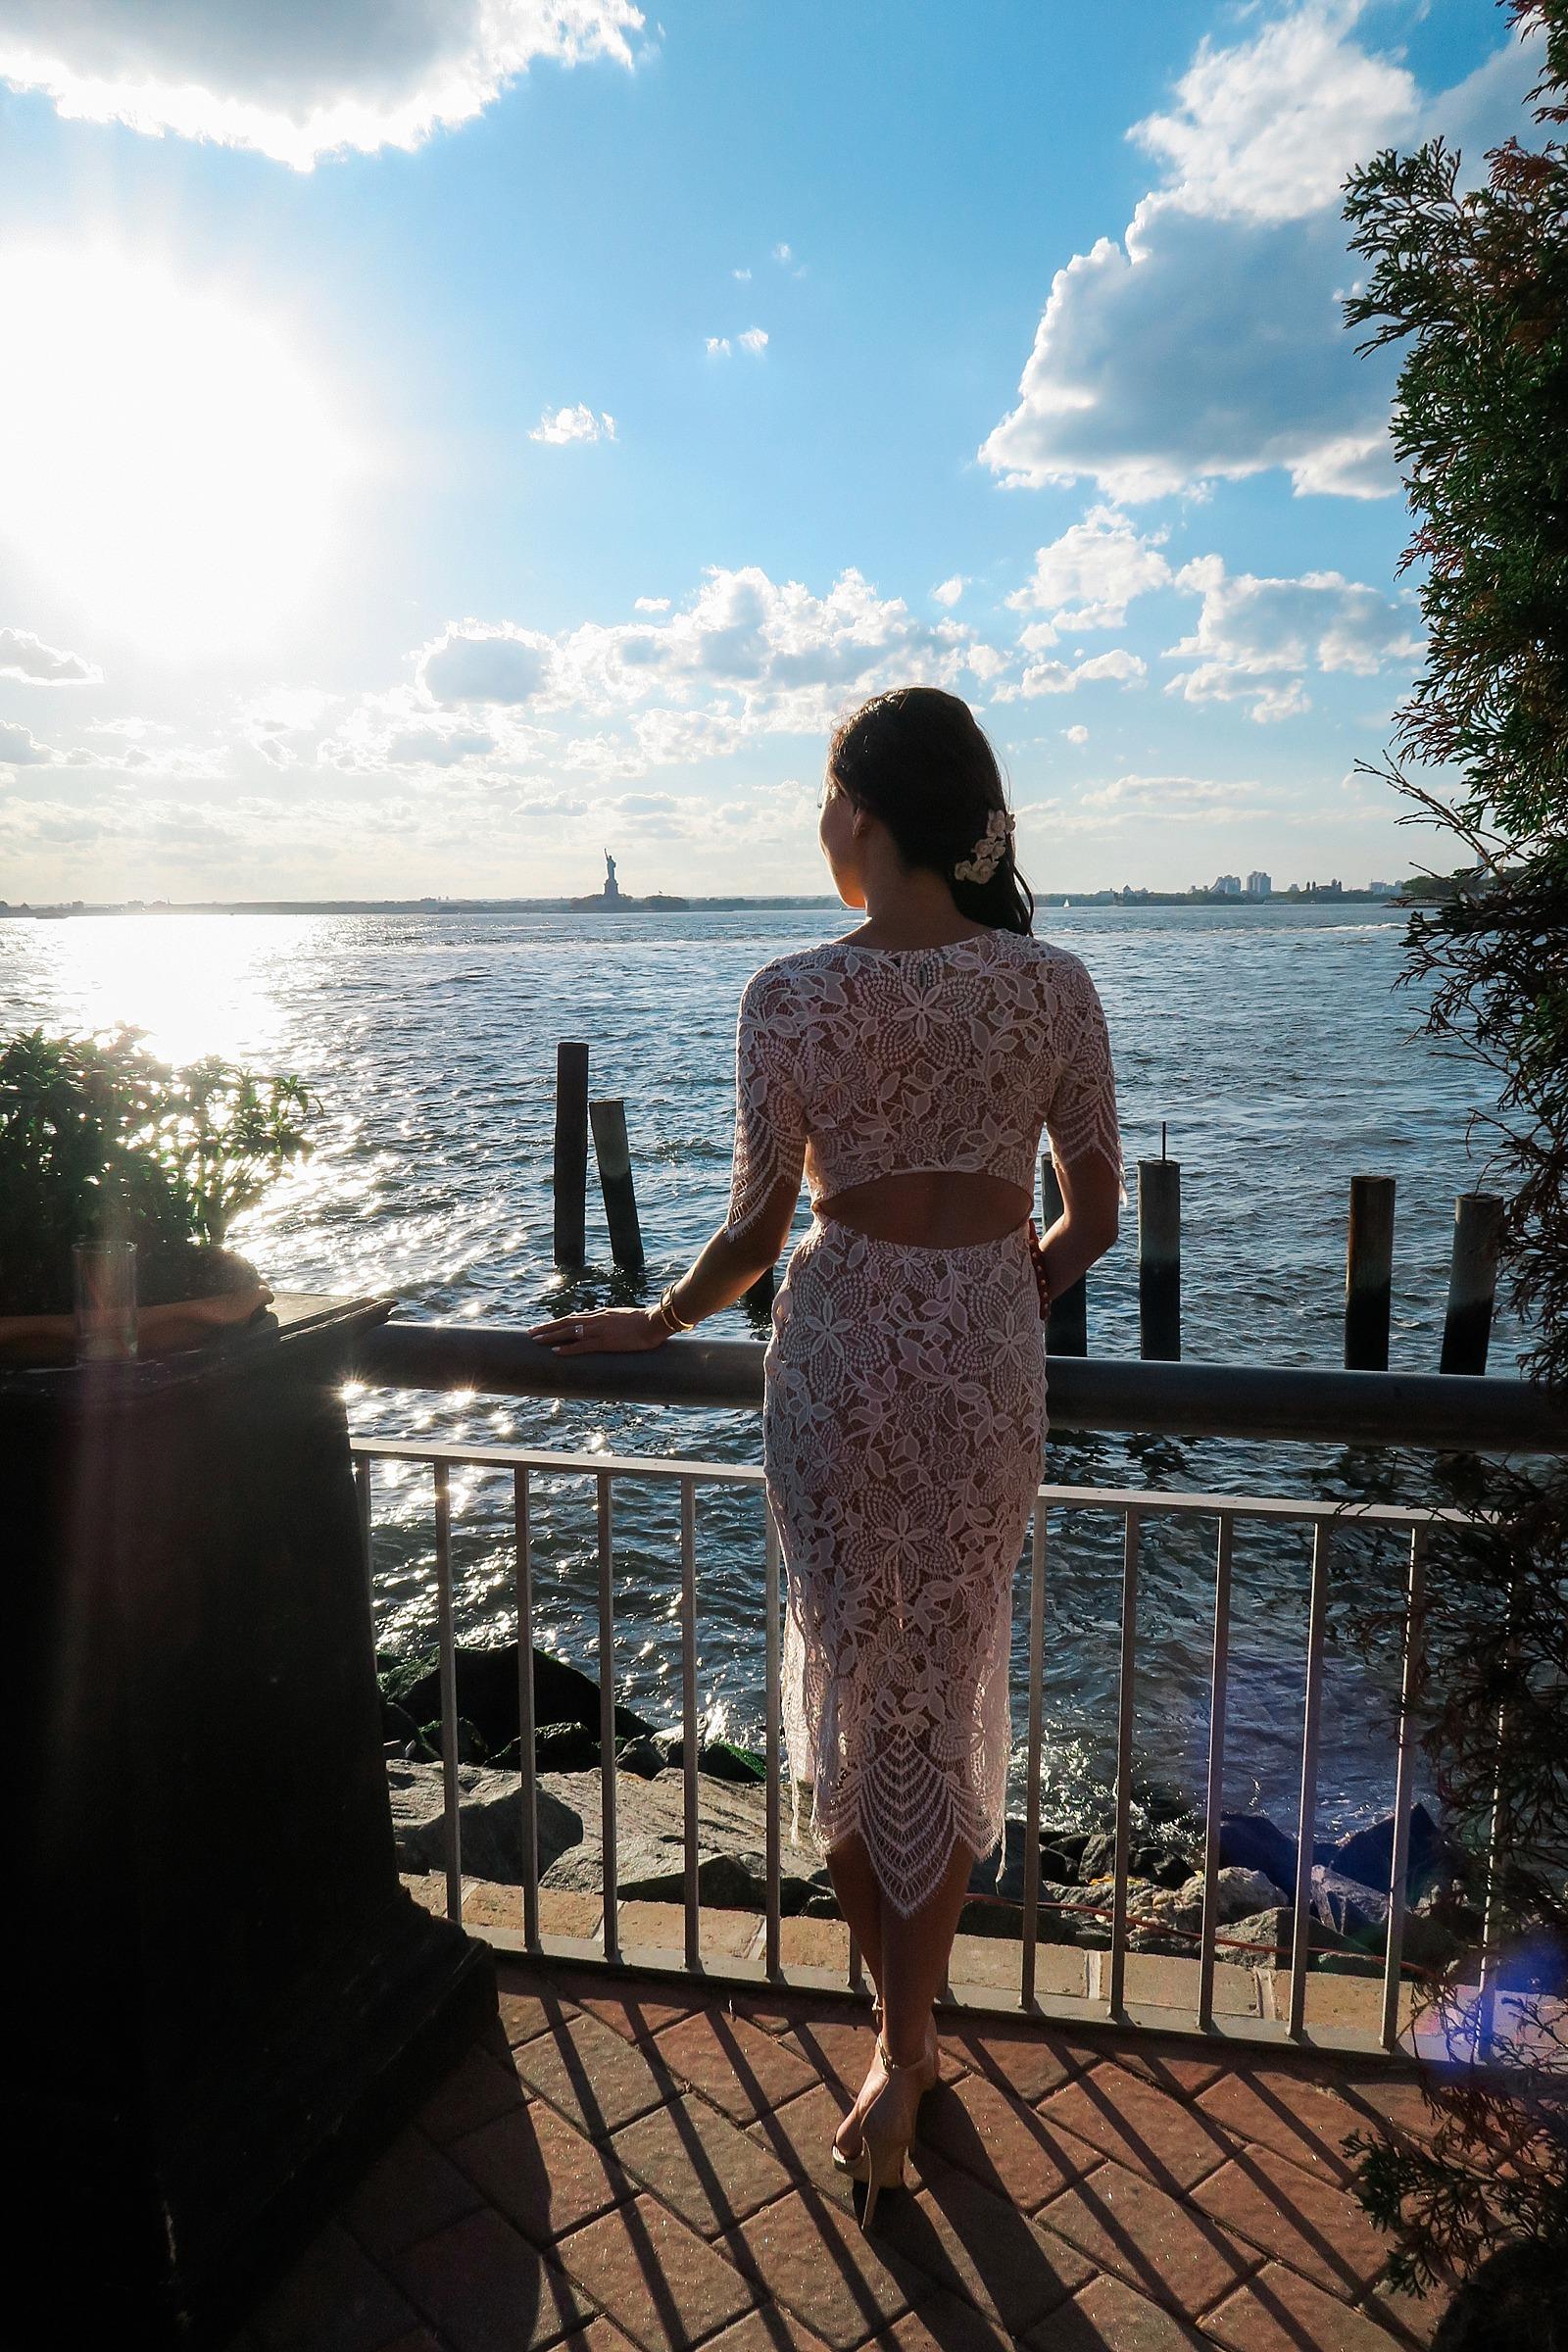 diana-elizabeth-steffen-phoenix-blogger-travel-new-york-brooklyn_0090